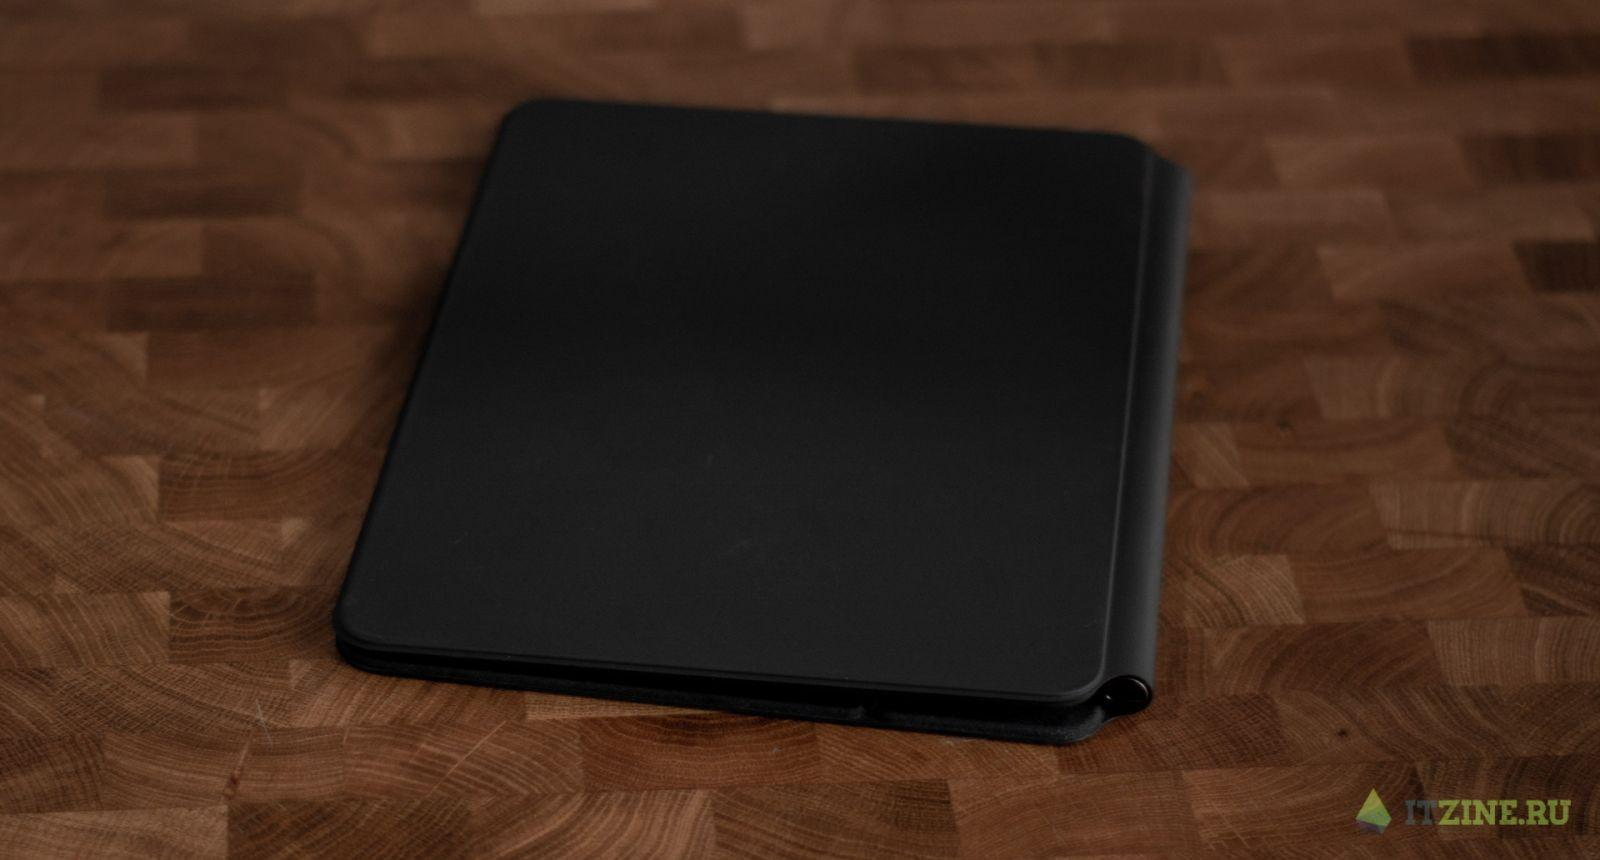 Дизайнерский рай. Обзор Apple iPad Pro 2020 + Apple Pencil + Magic Keyboard (dsc 8823)